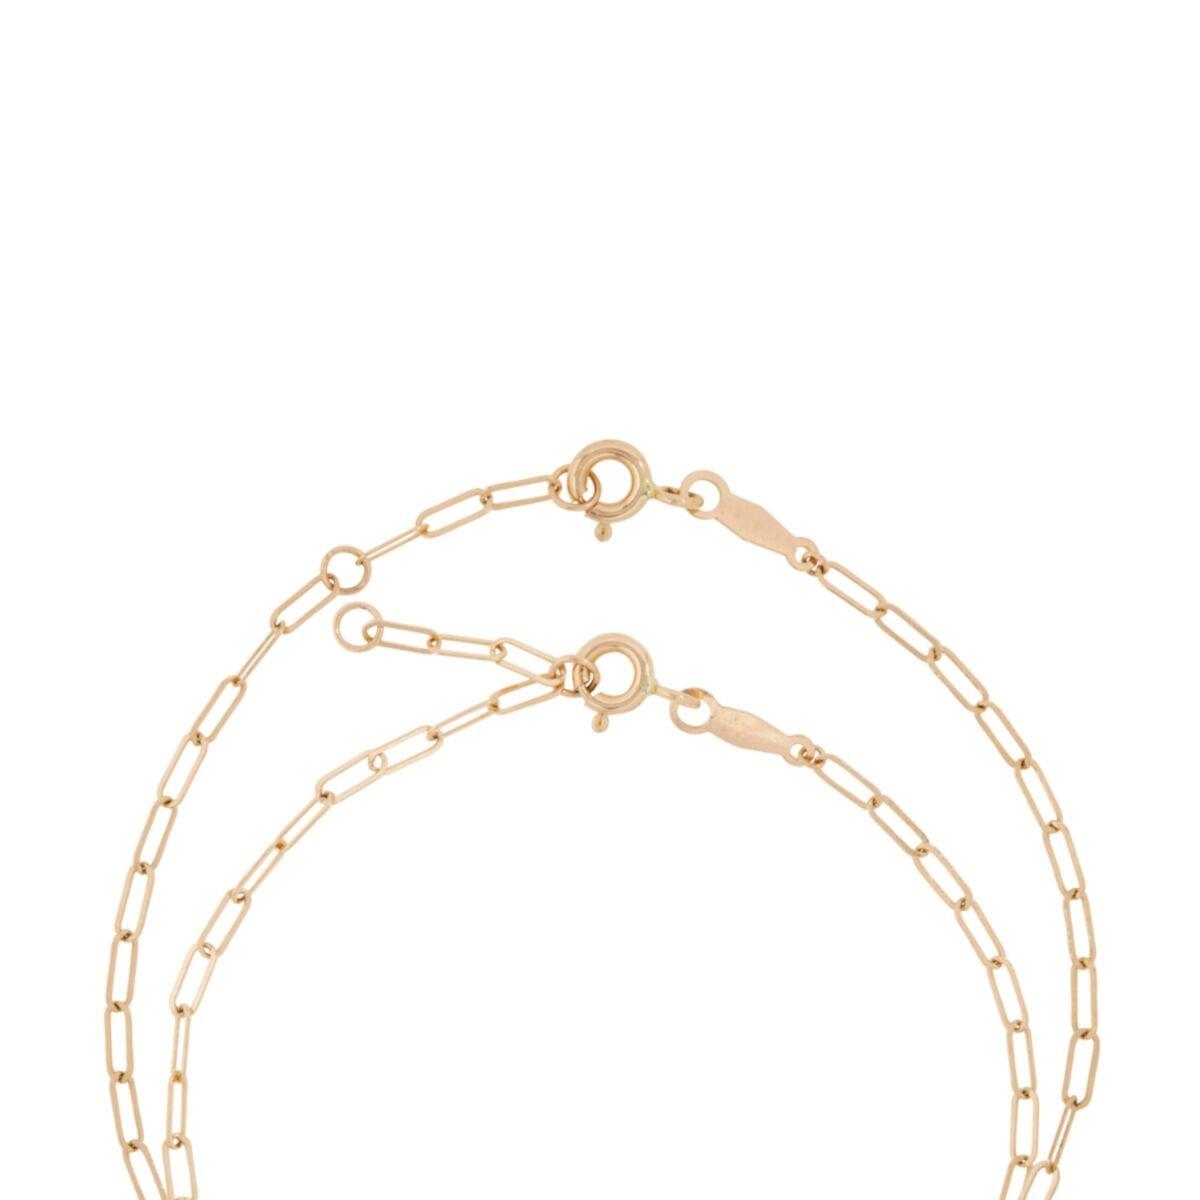 1976 Bracelet image